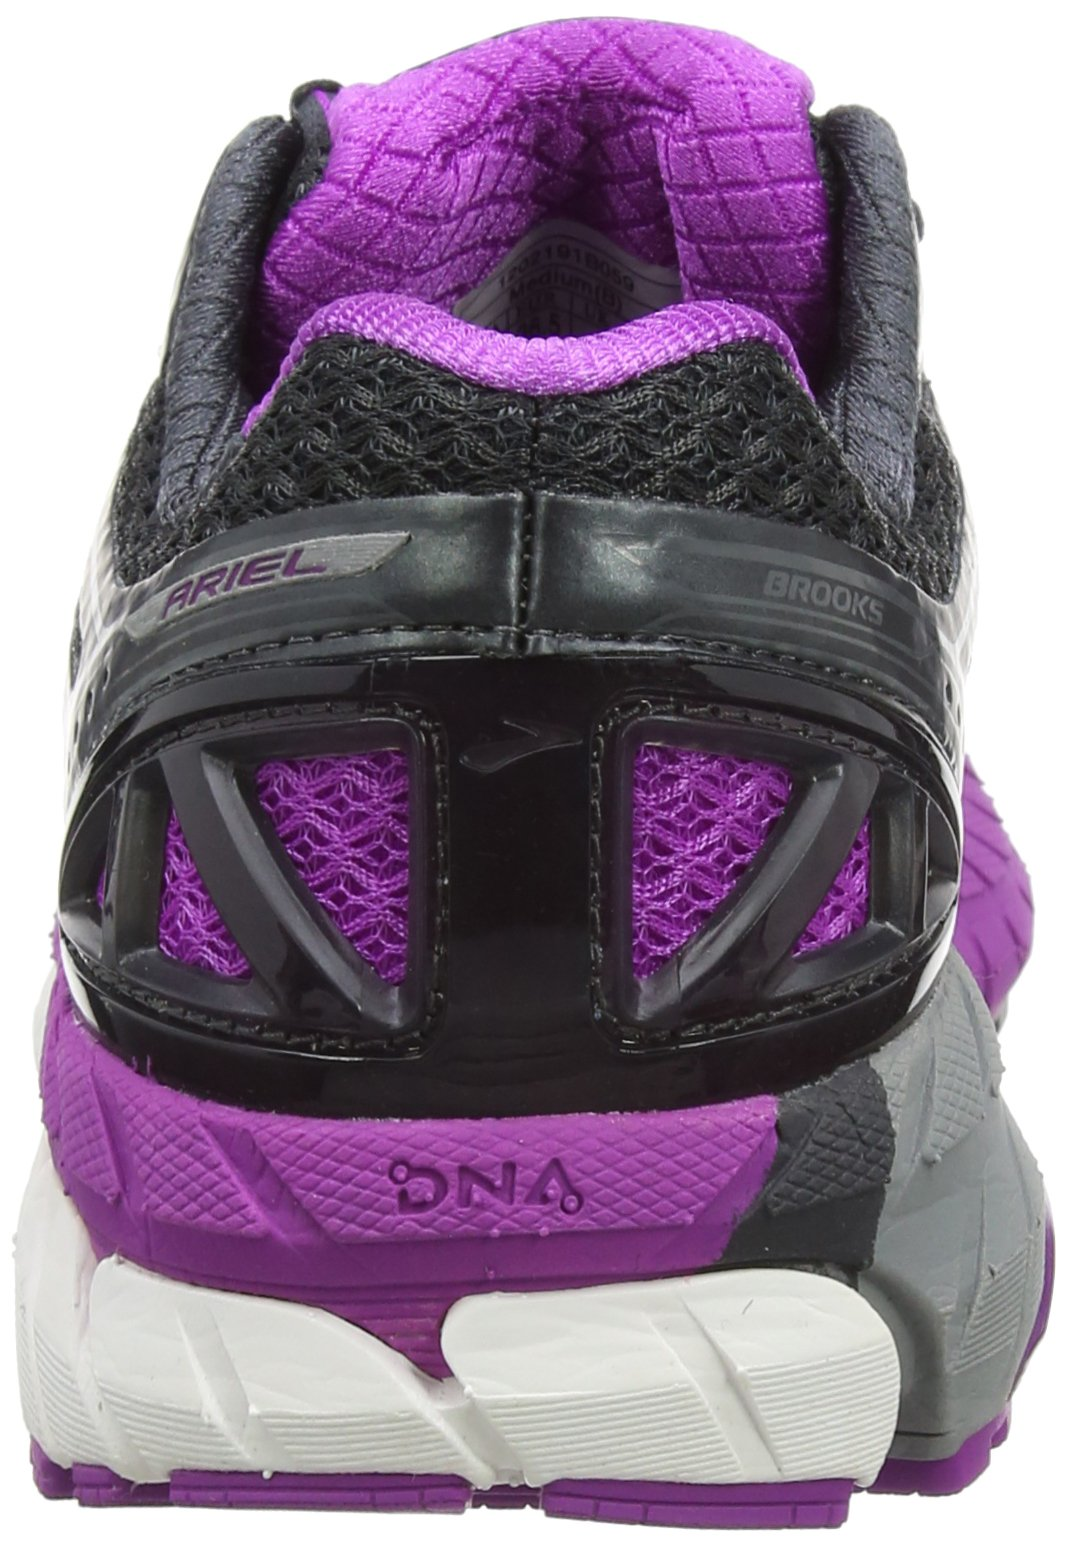 71s2diyrgdL - Brooks Women's Ariel '16 Running Shoes